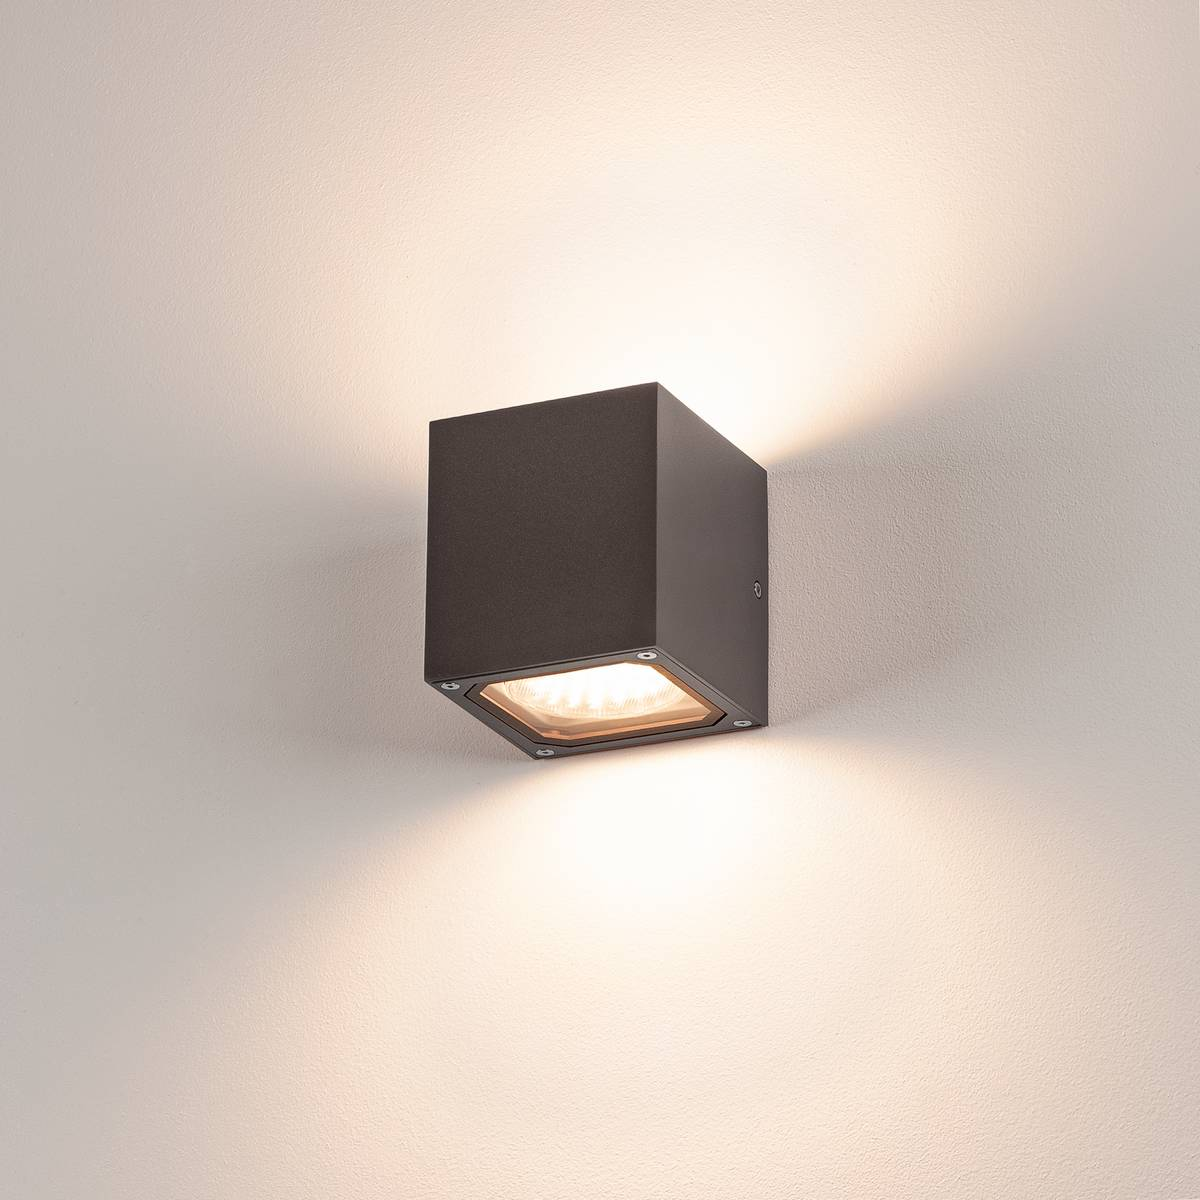 Sitra Cube Anthrazit 2xgx53